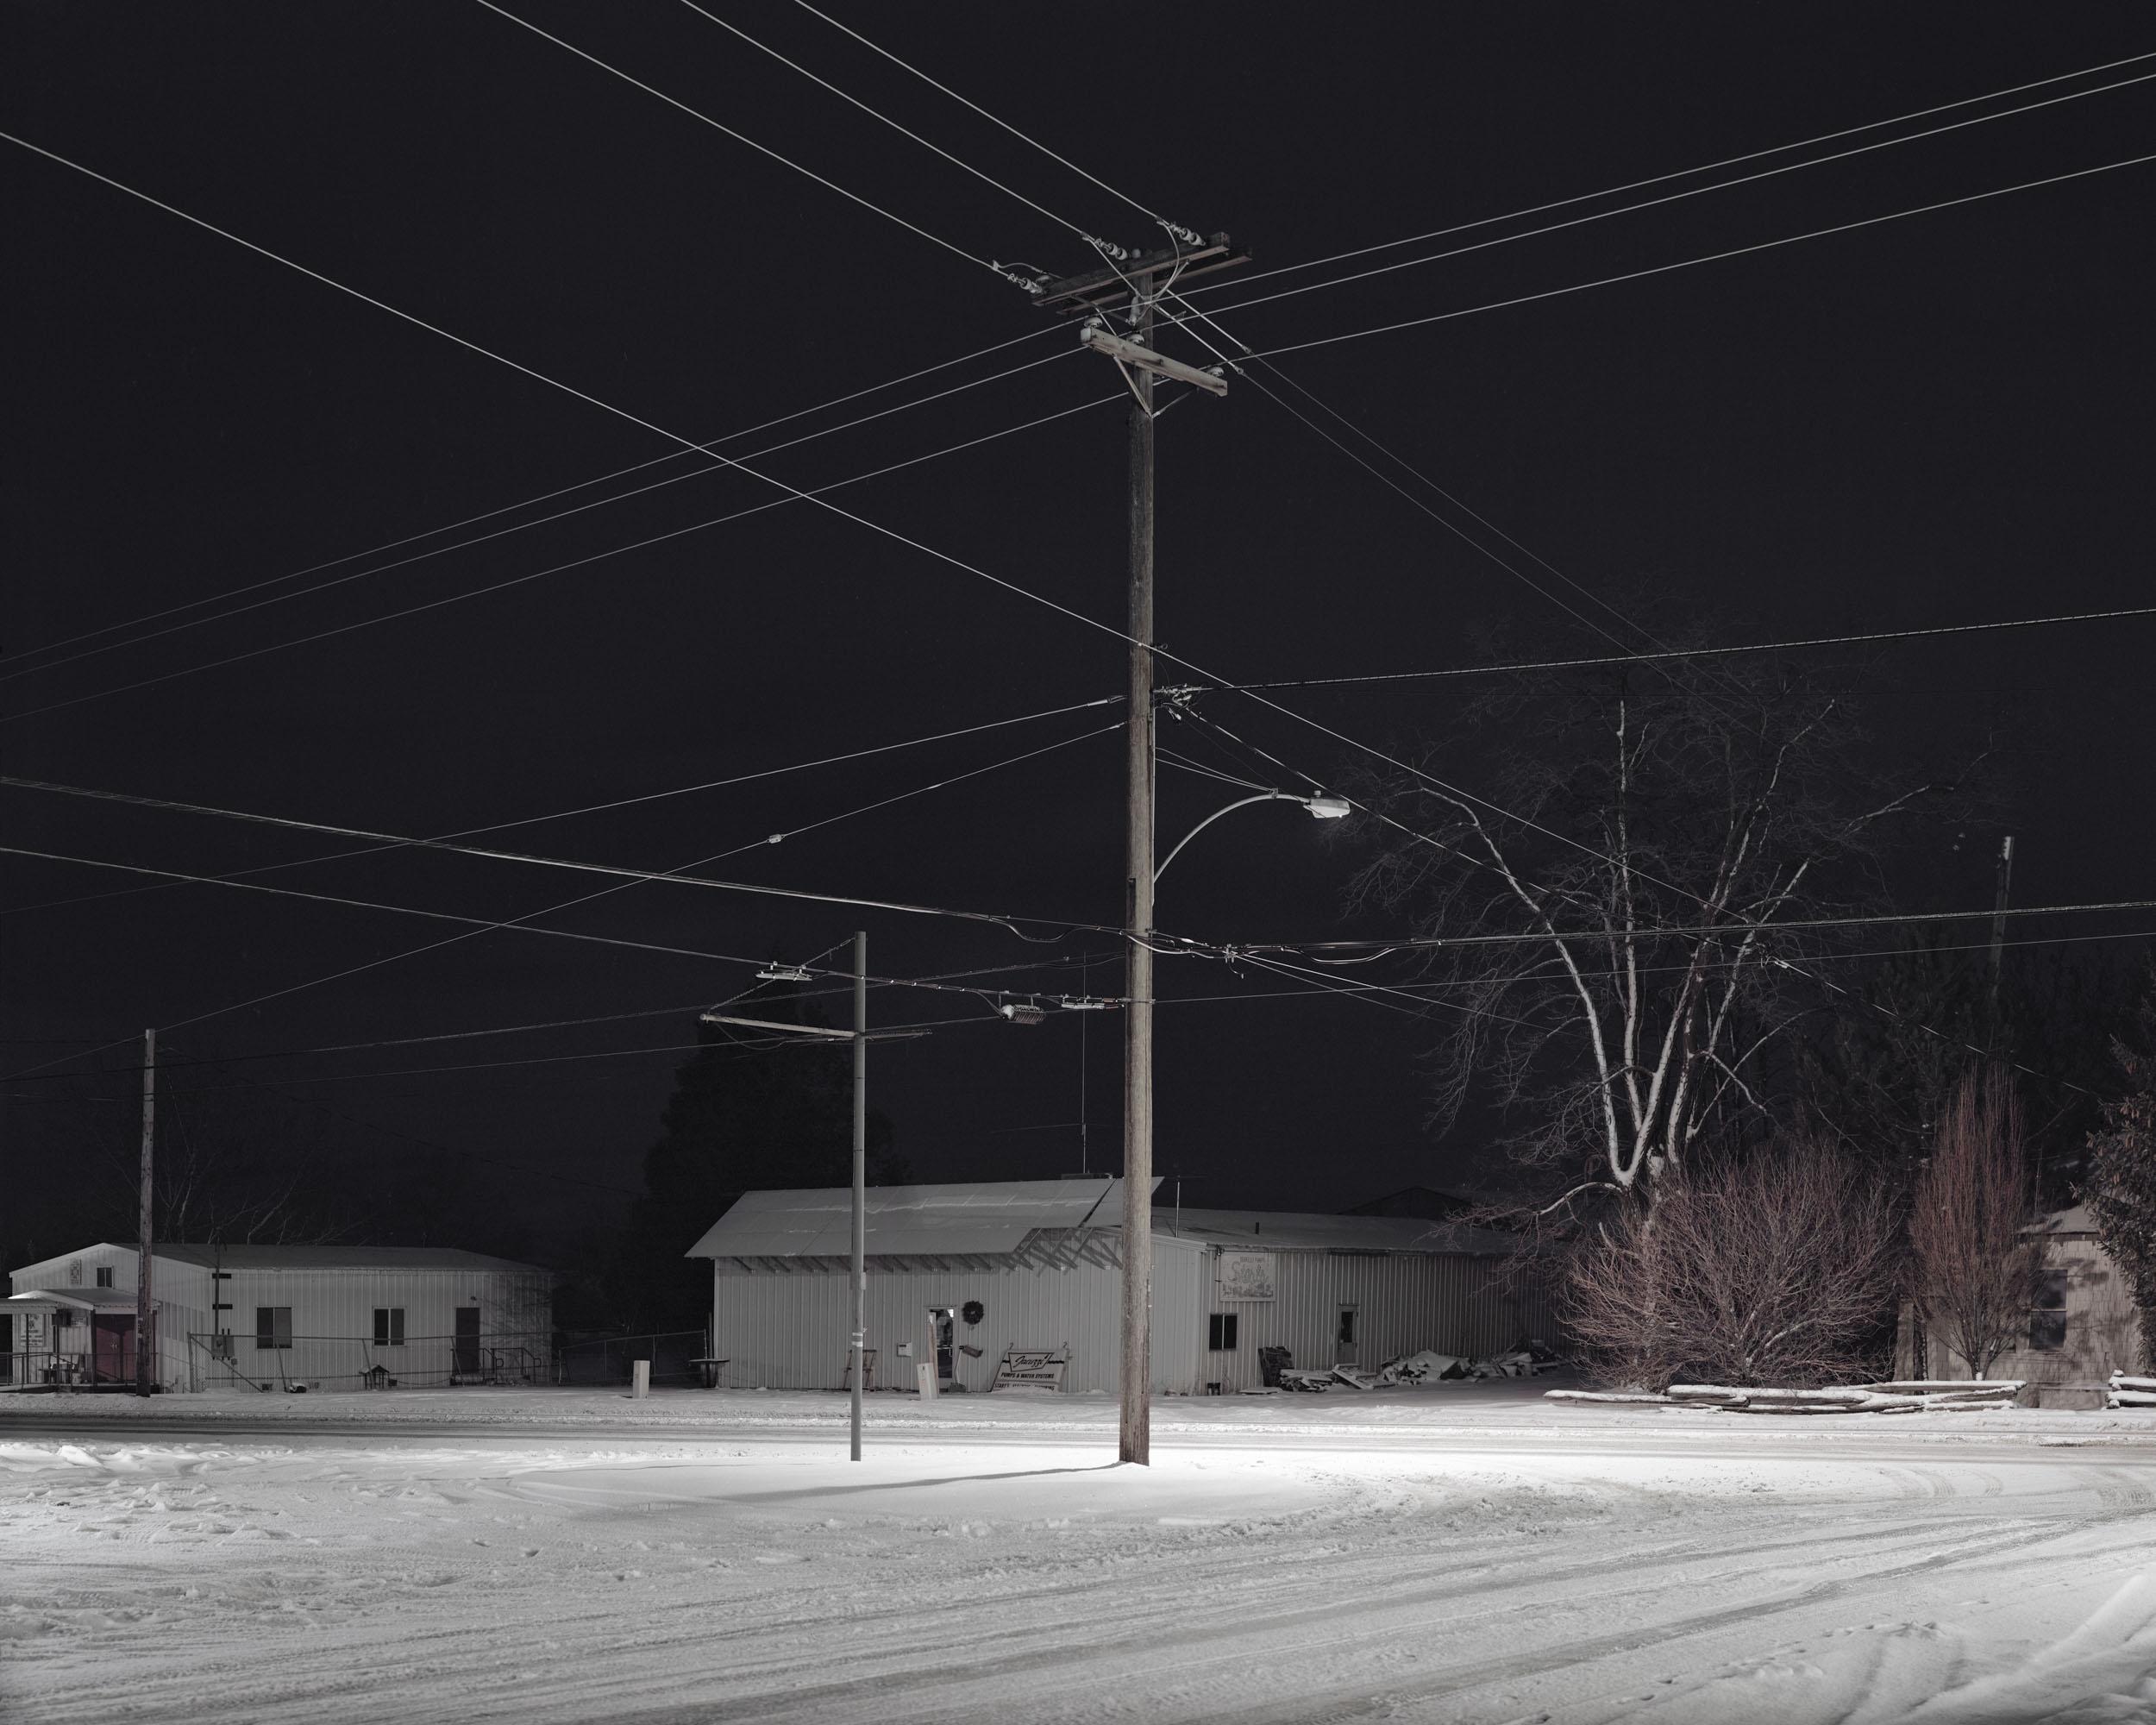 Crossroad at night